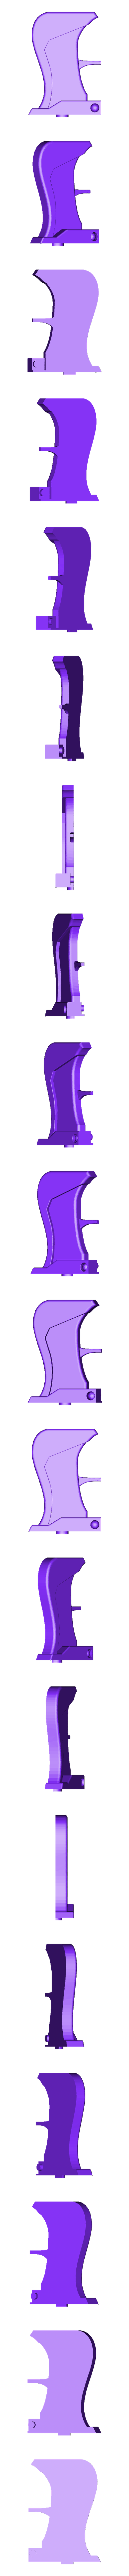 handgrip_left_1.stl Download free STL file 9 gague plasma pistol with barrel tip cover (MPMS mini) • 3D print template, PM_ME_YOUR_VALUE